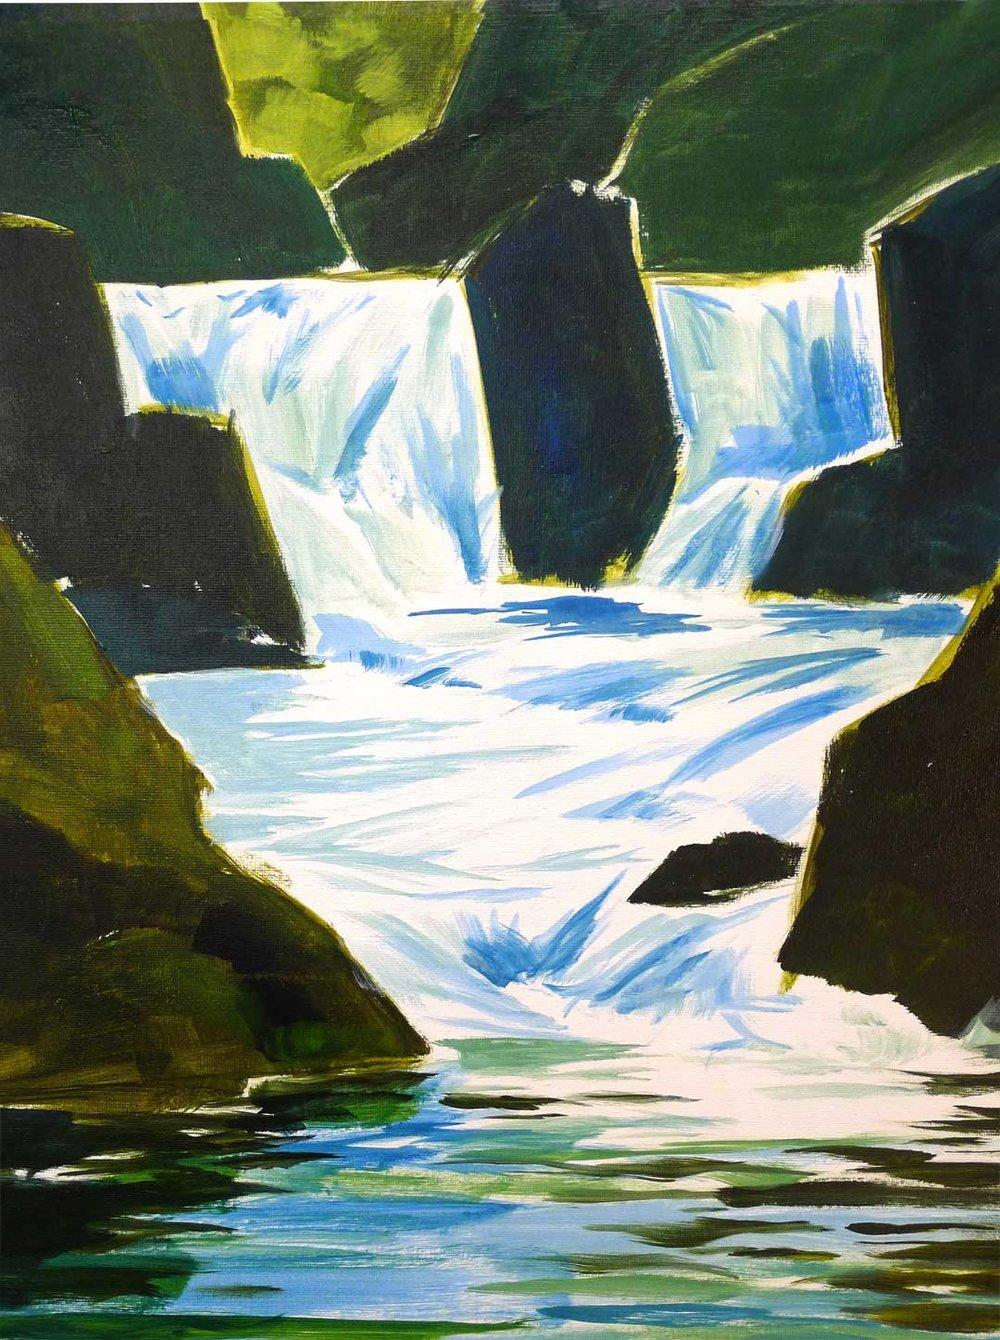 waterfall-paint-demo-6.jpg